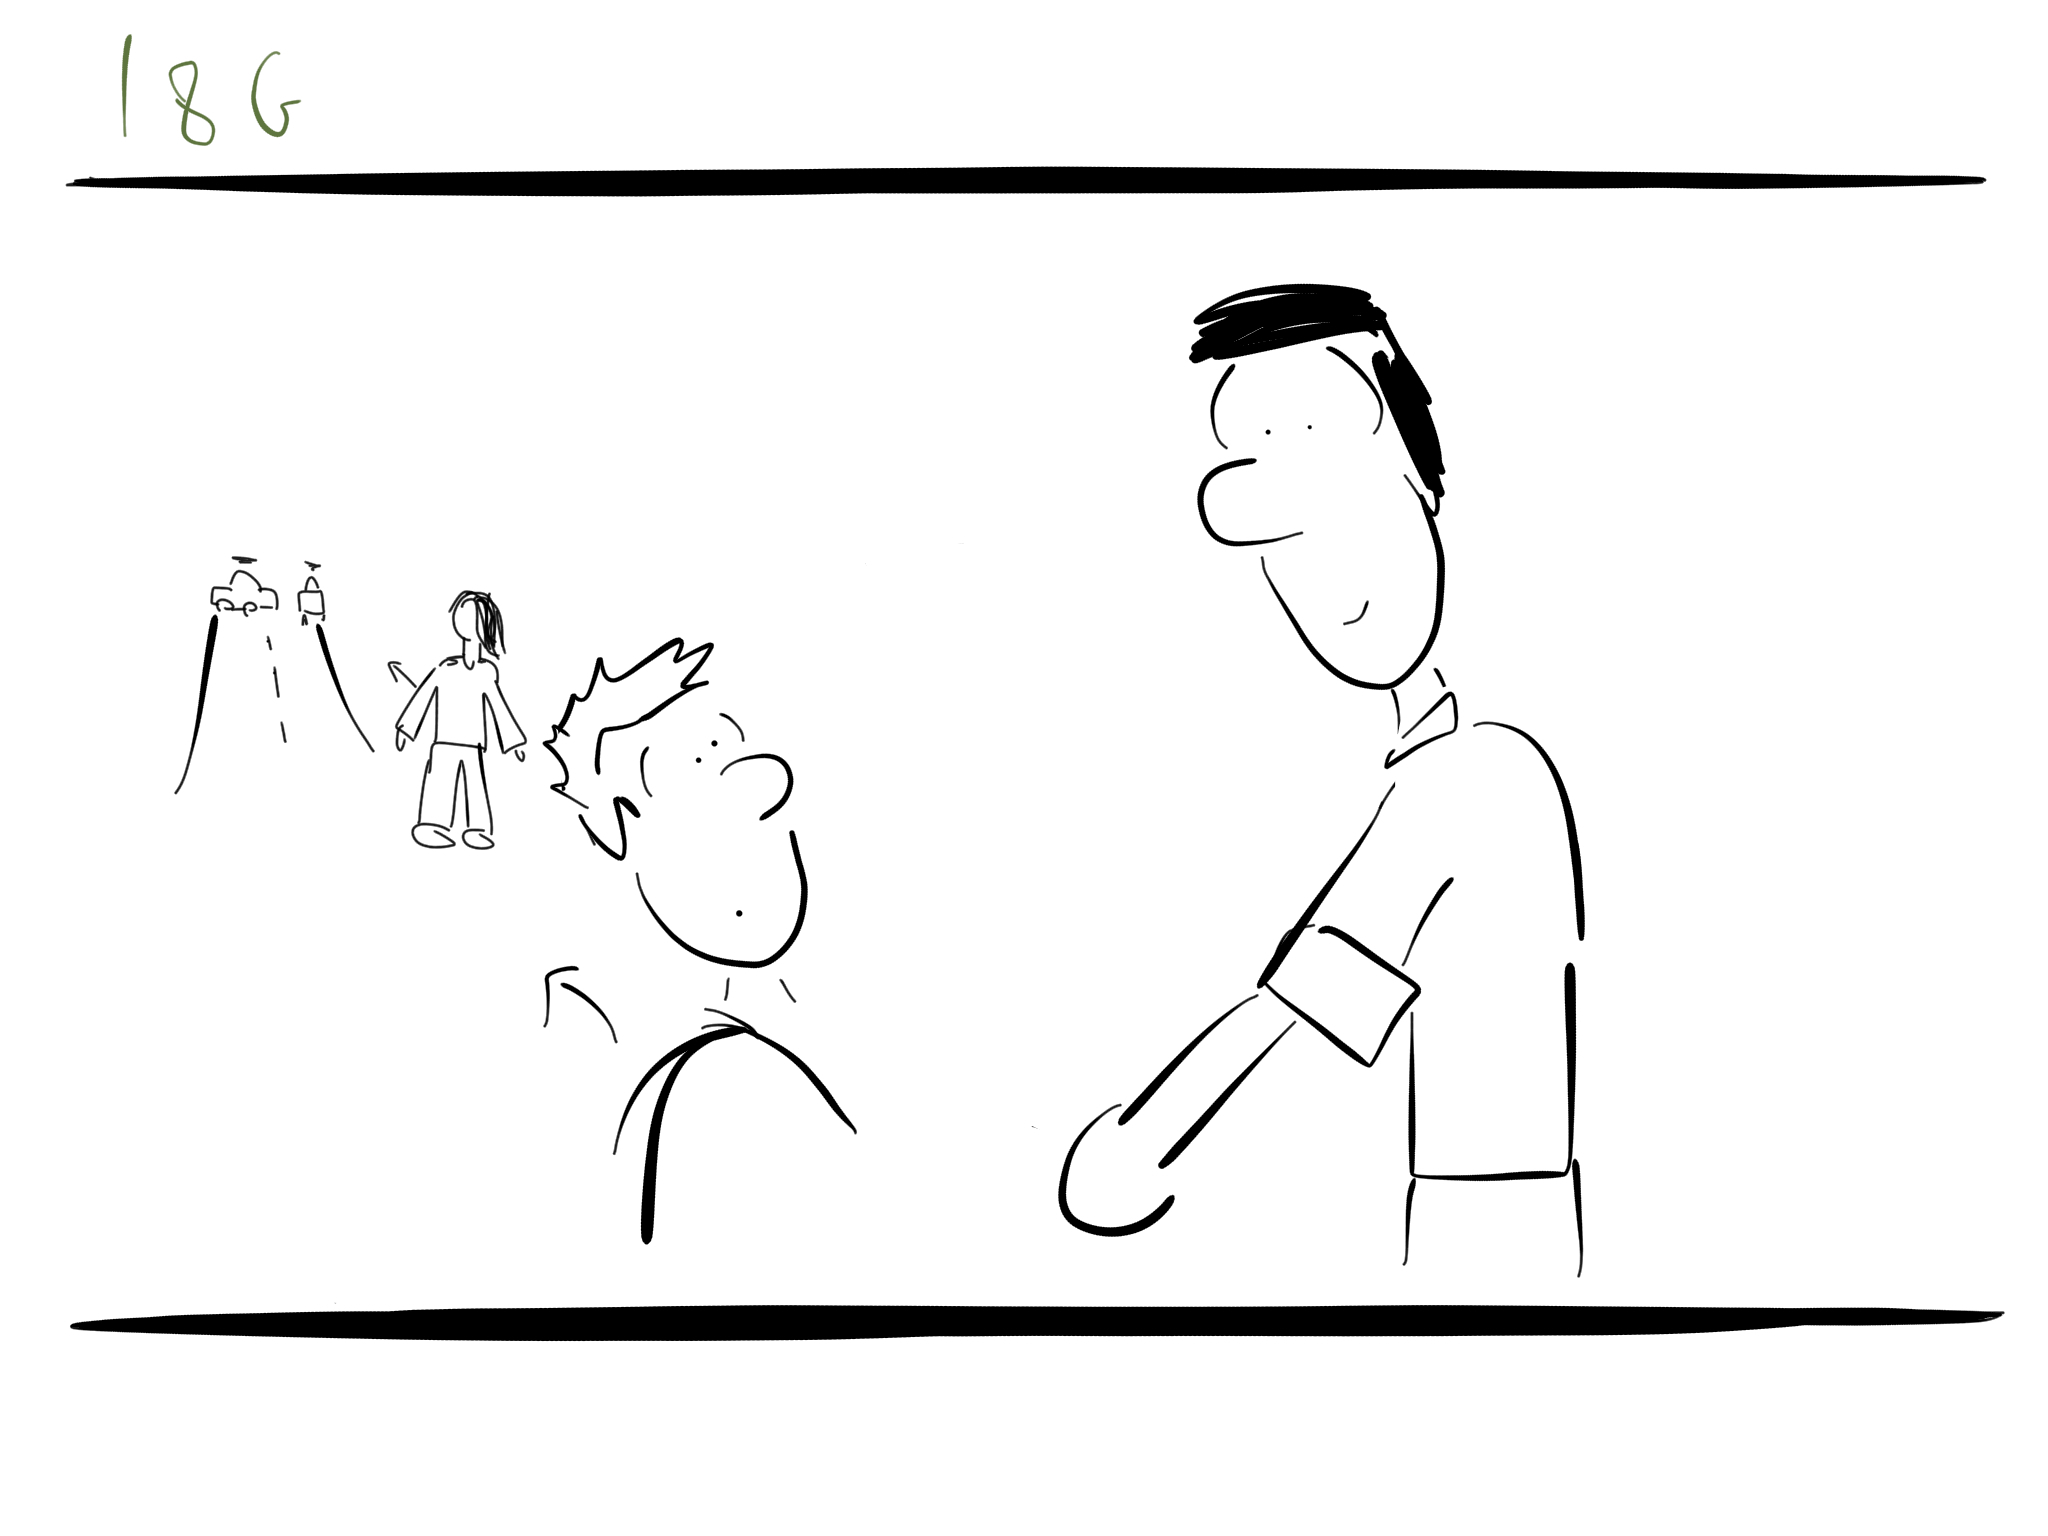 BDF_Storyboards_89.jpg